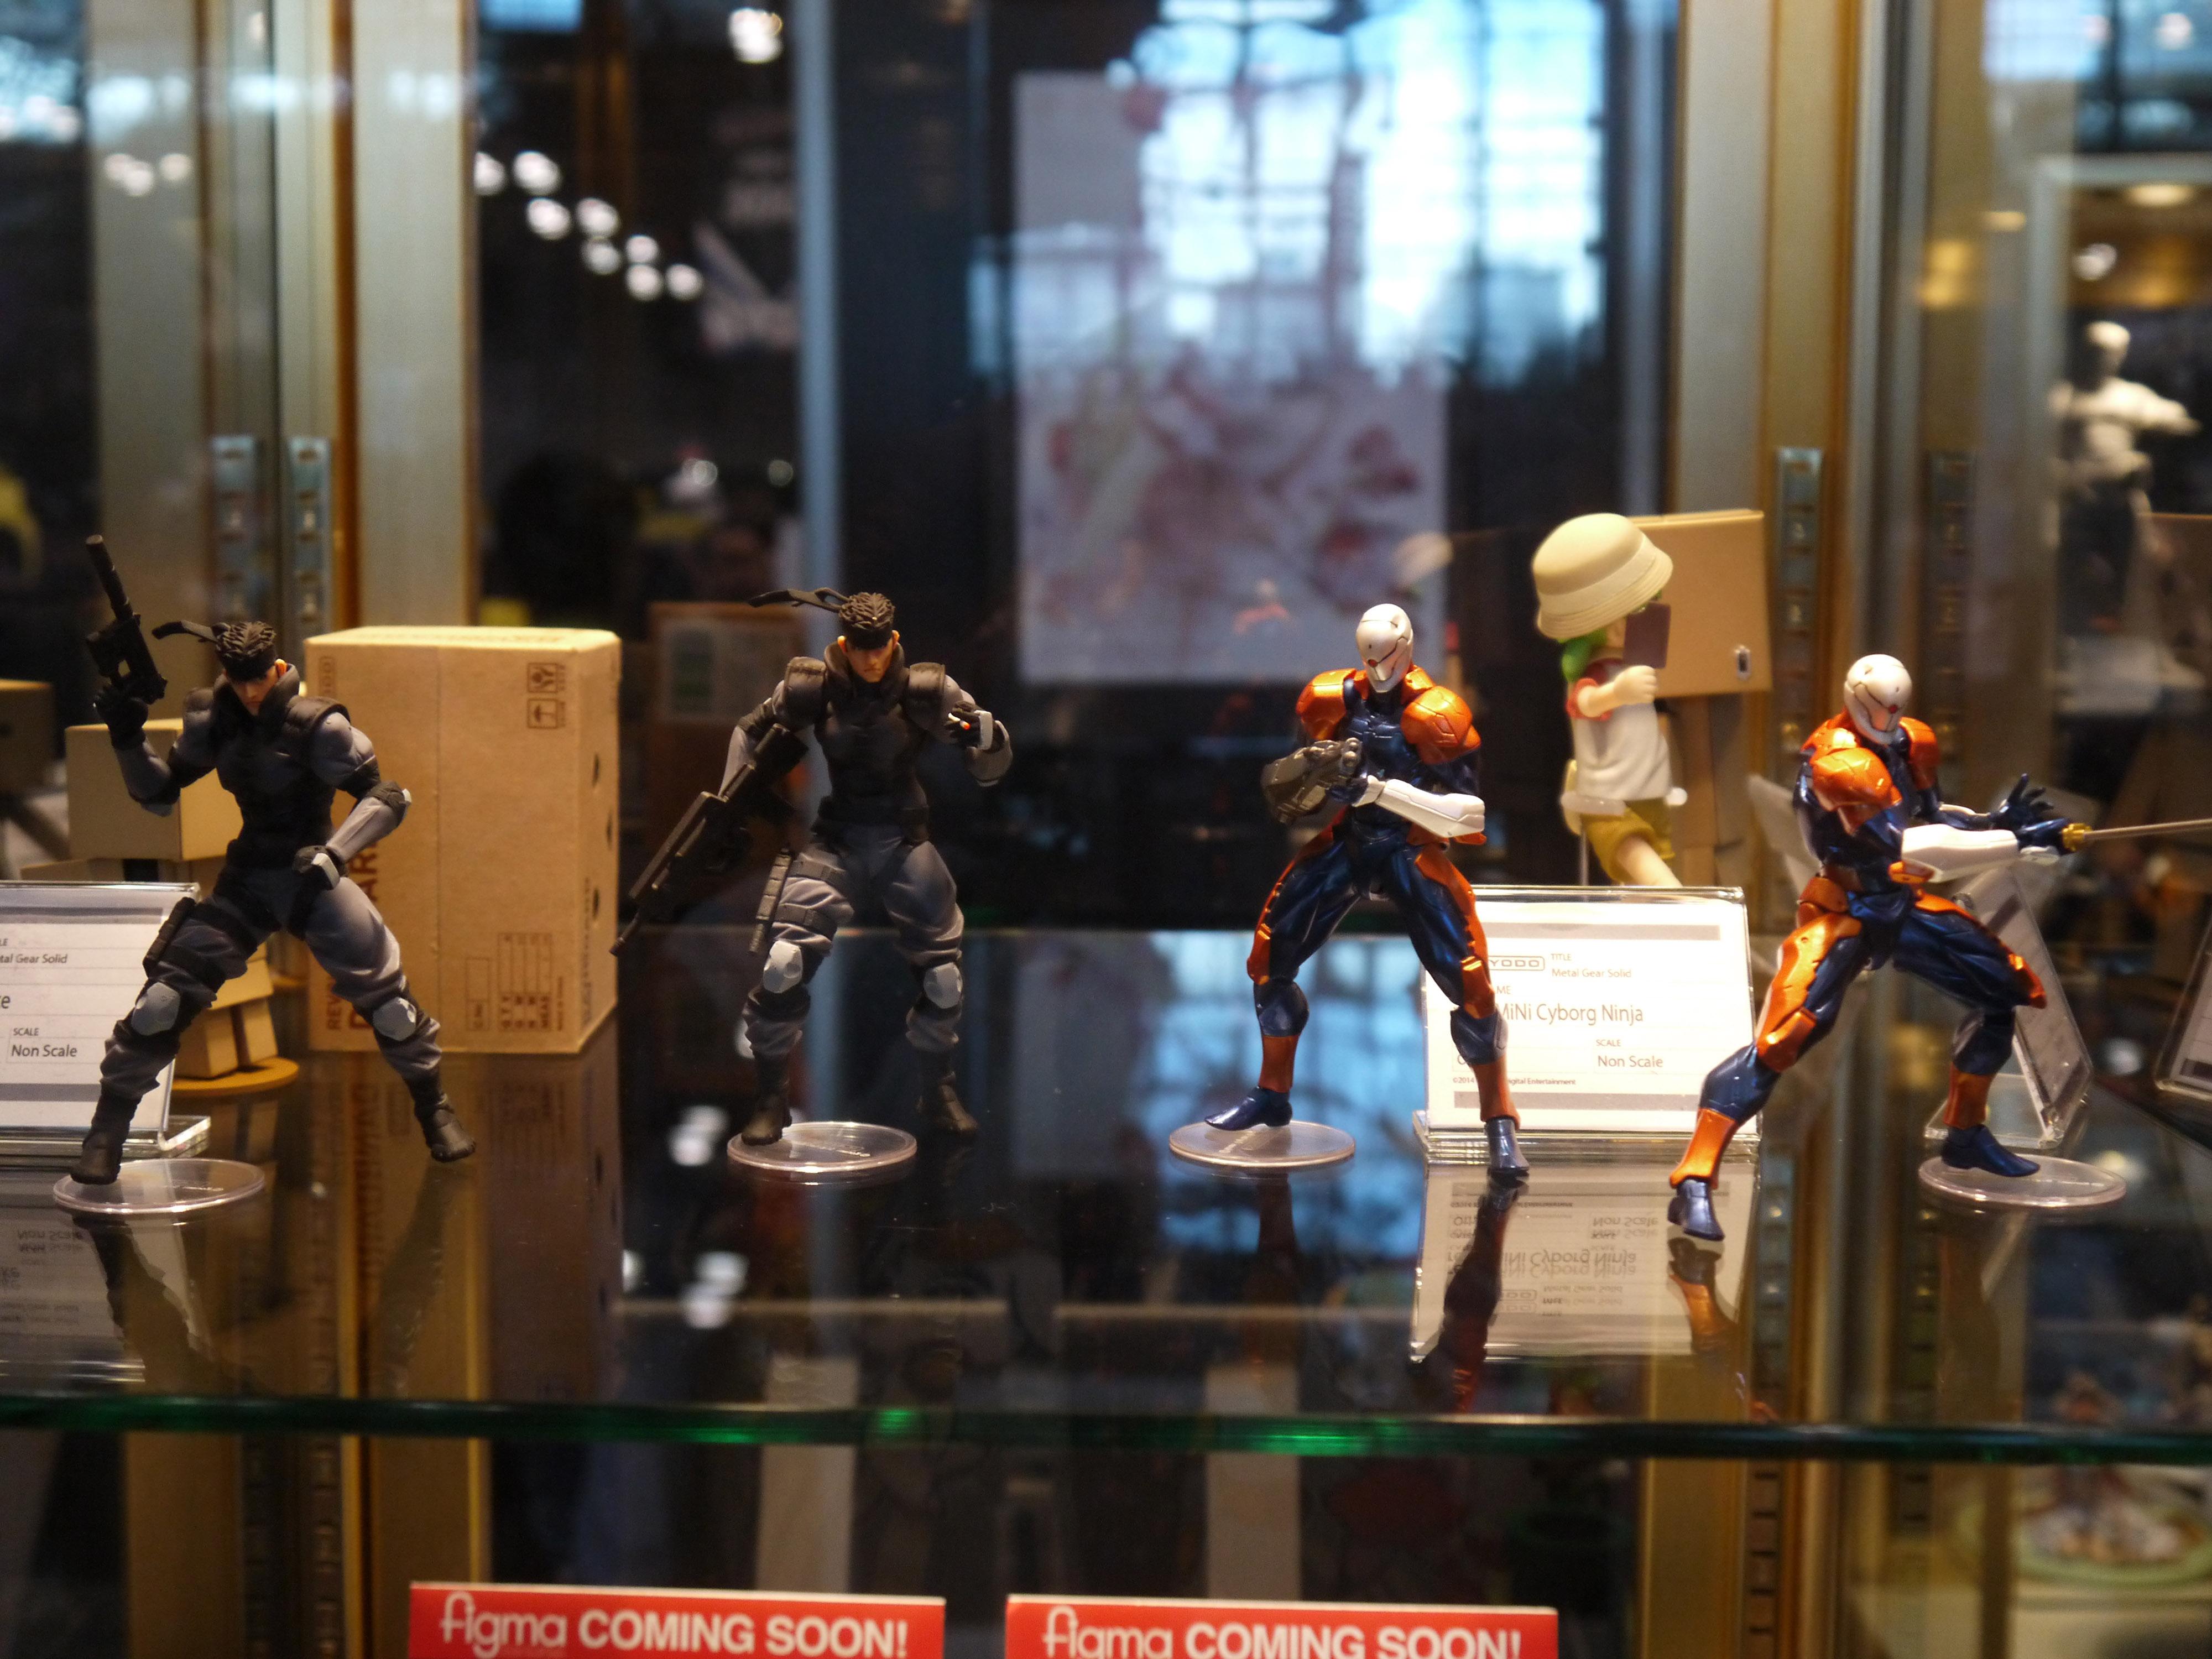 revolmini revoltech yamaguchi_katsuhisa kaiyodo solid_snake metal_gear_solid cyborg_ninja